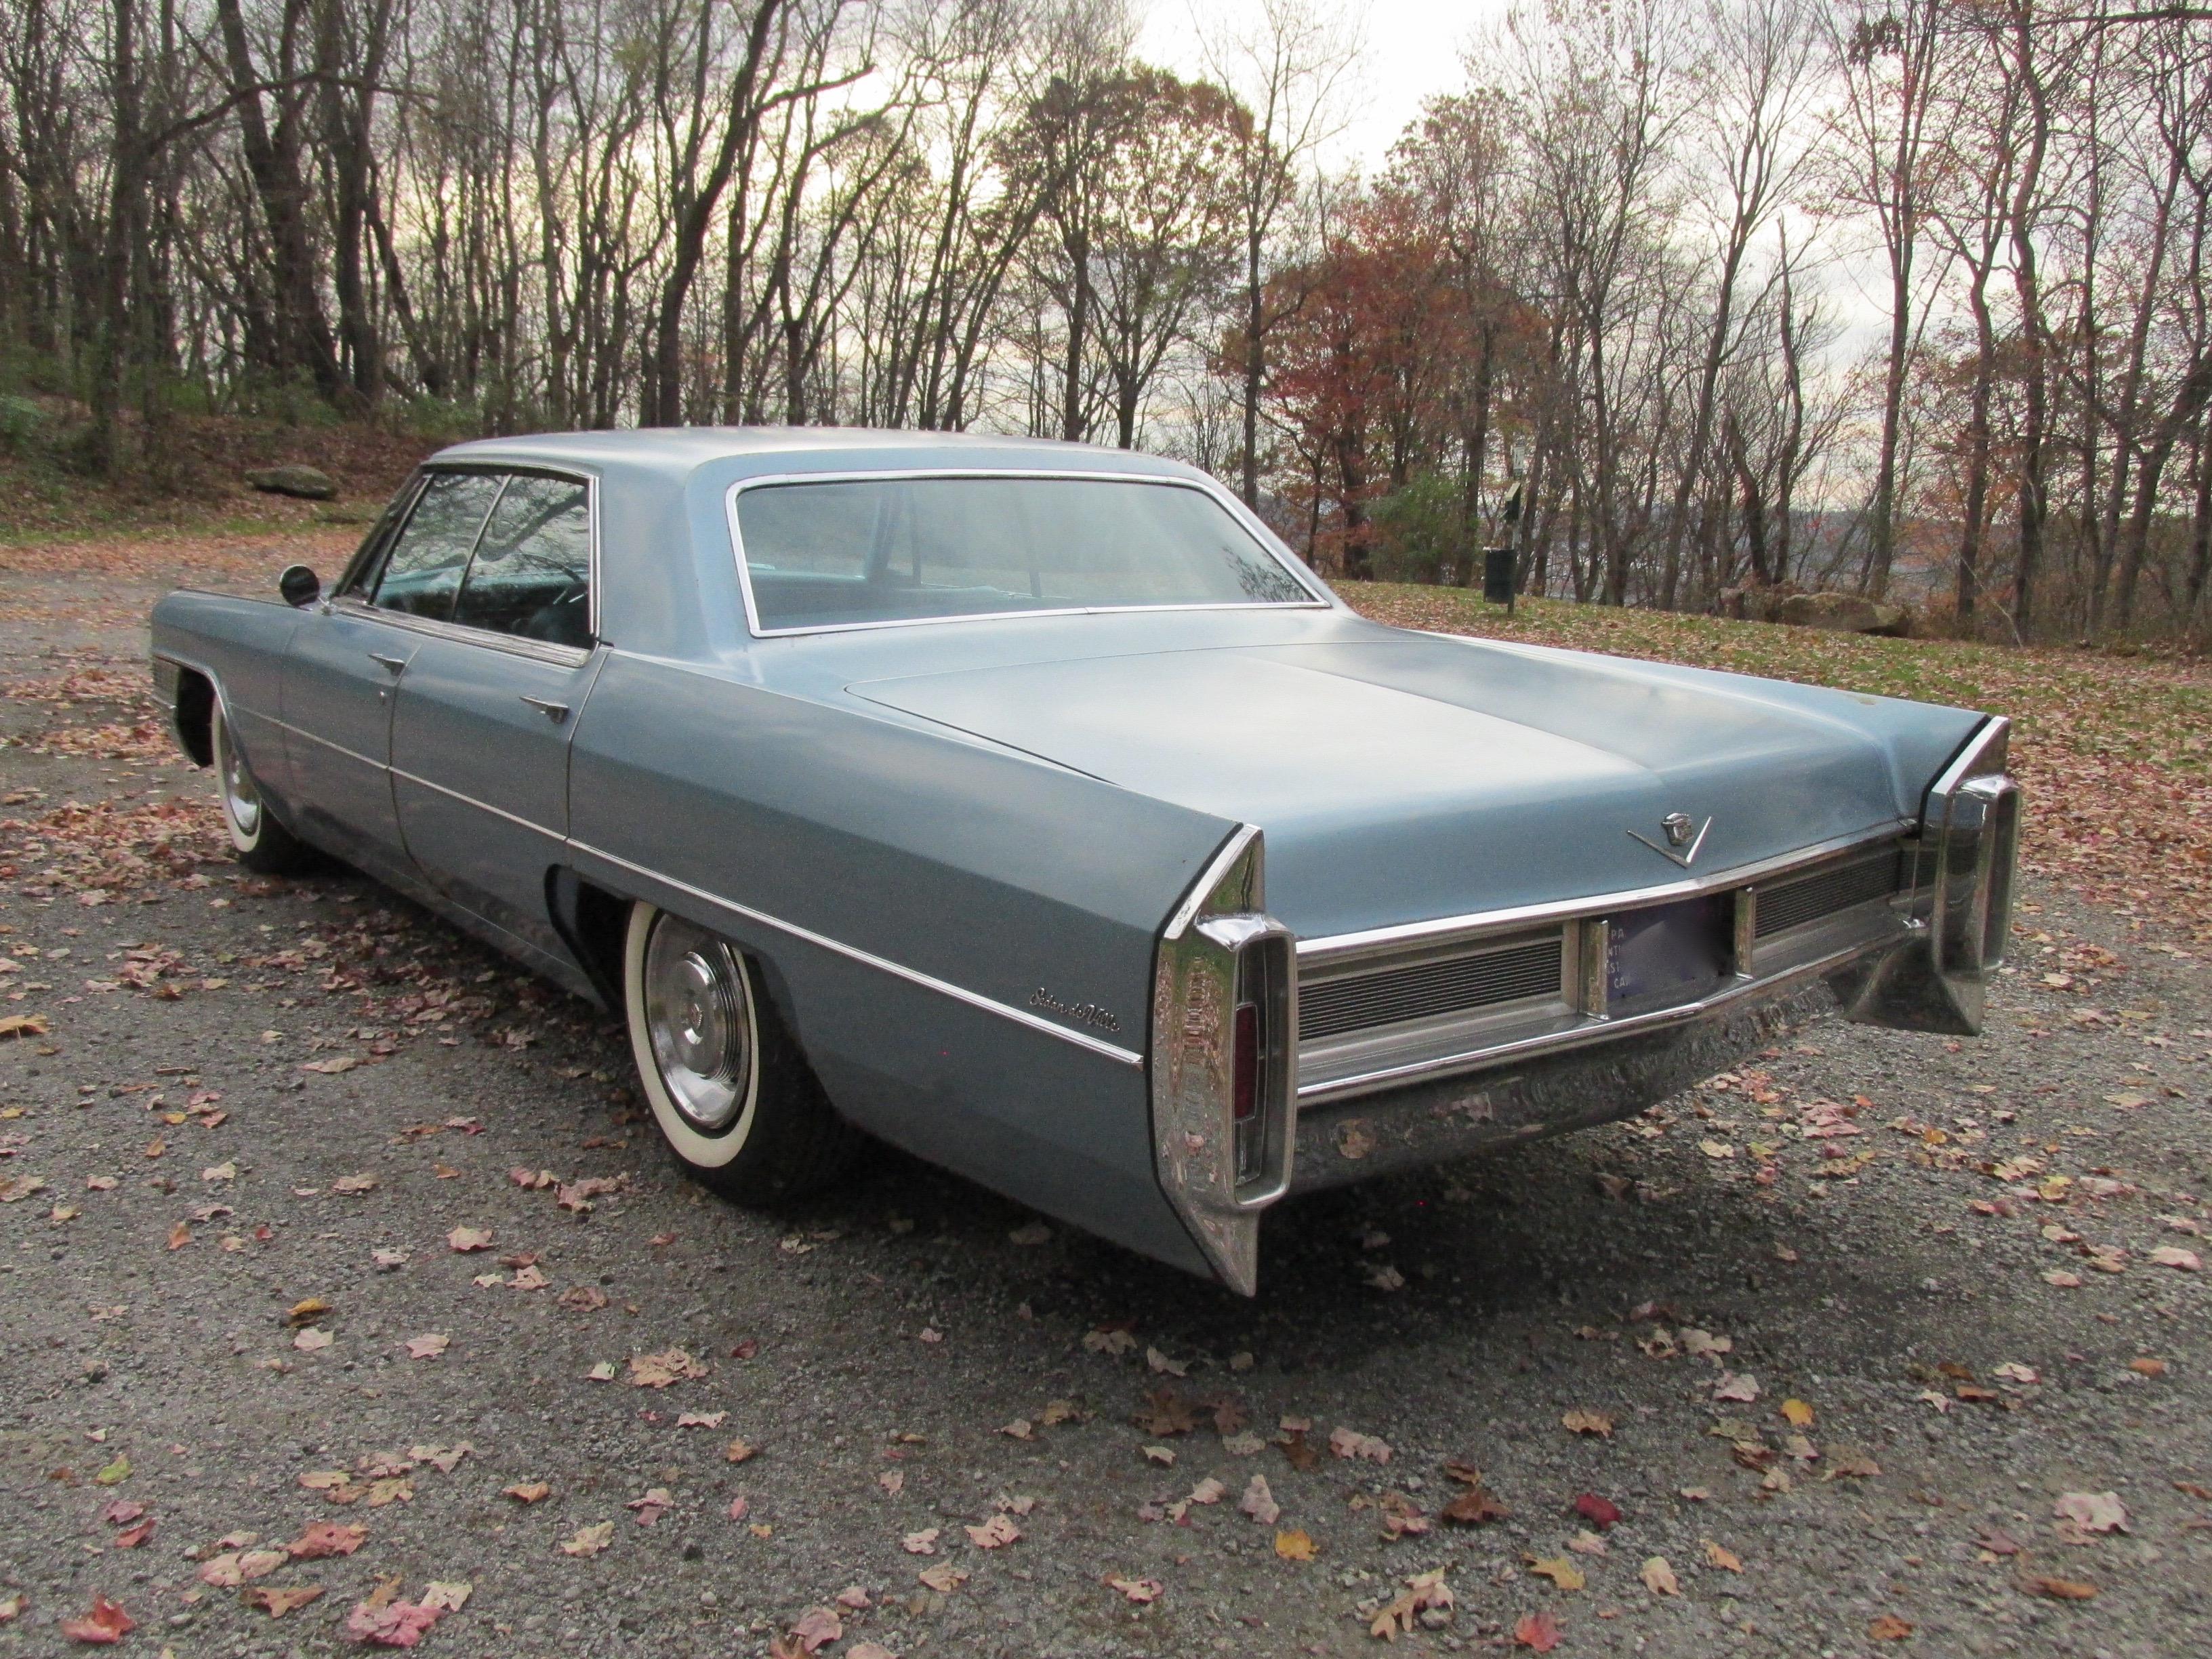 1965 Cadillac Sedan DeVille - Fort Pitt Classic Cars